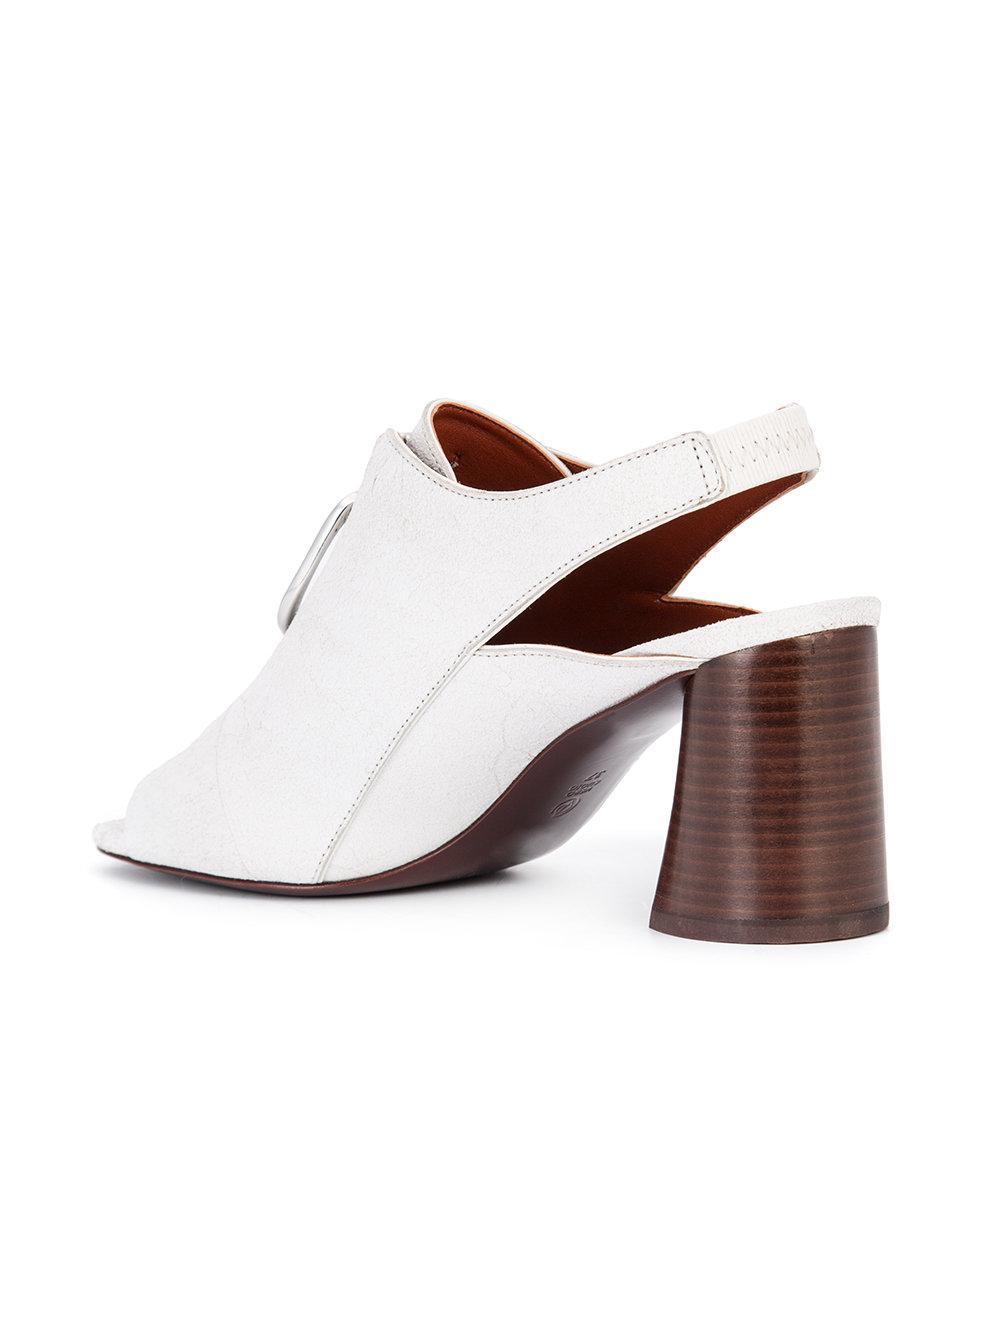 Db Drum Shoes Uk